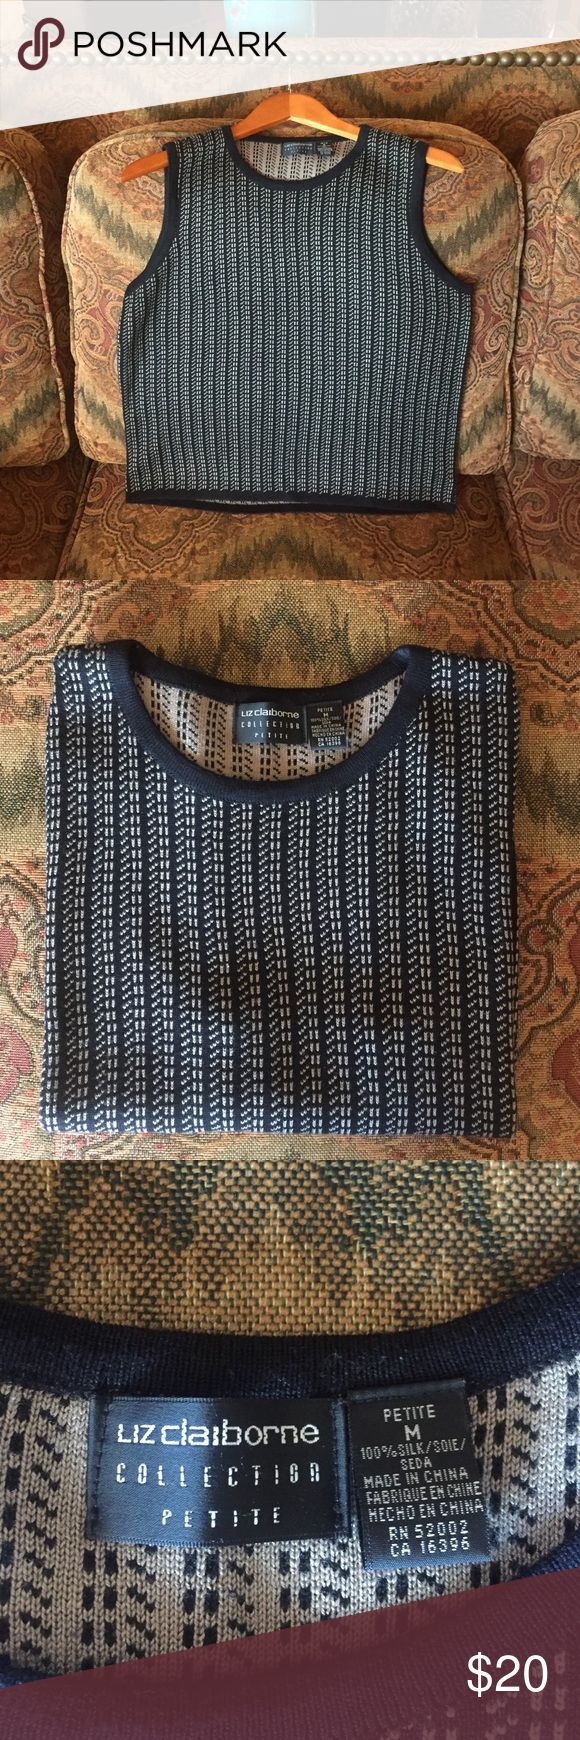 Sleeveless sweater Beautiful pattern Liz Claiborne sleeveless sweater. Liz Claiborne Sweaters Crew & Scoop Necks